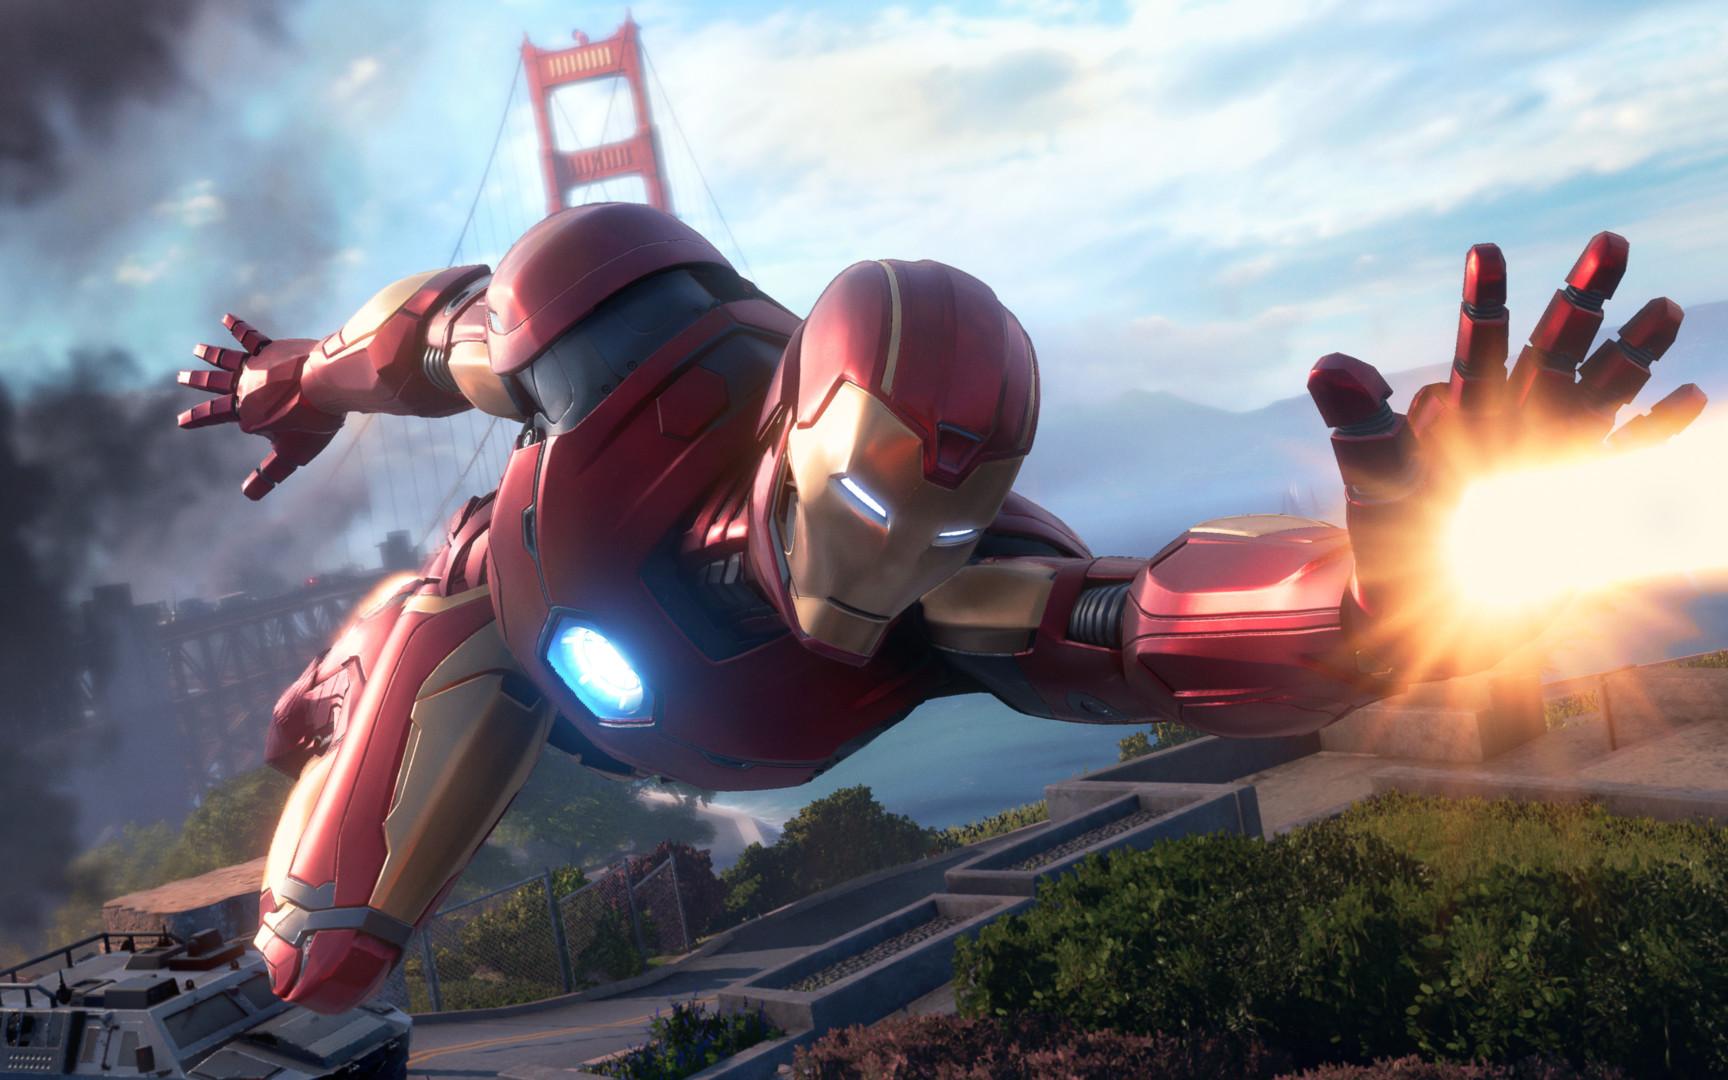 Marvel's Avengers mostró un adelanto de su jugabilidad en la gran feria europea Gamescom